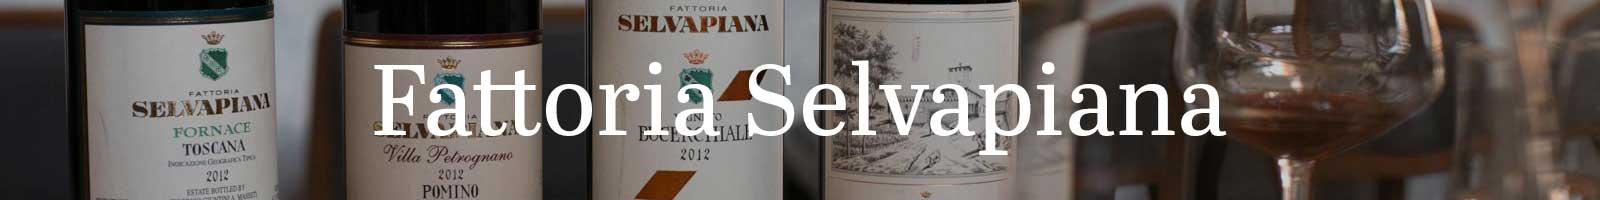 Essential Winemakers of Italy: Fattoria Selvapiana